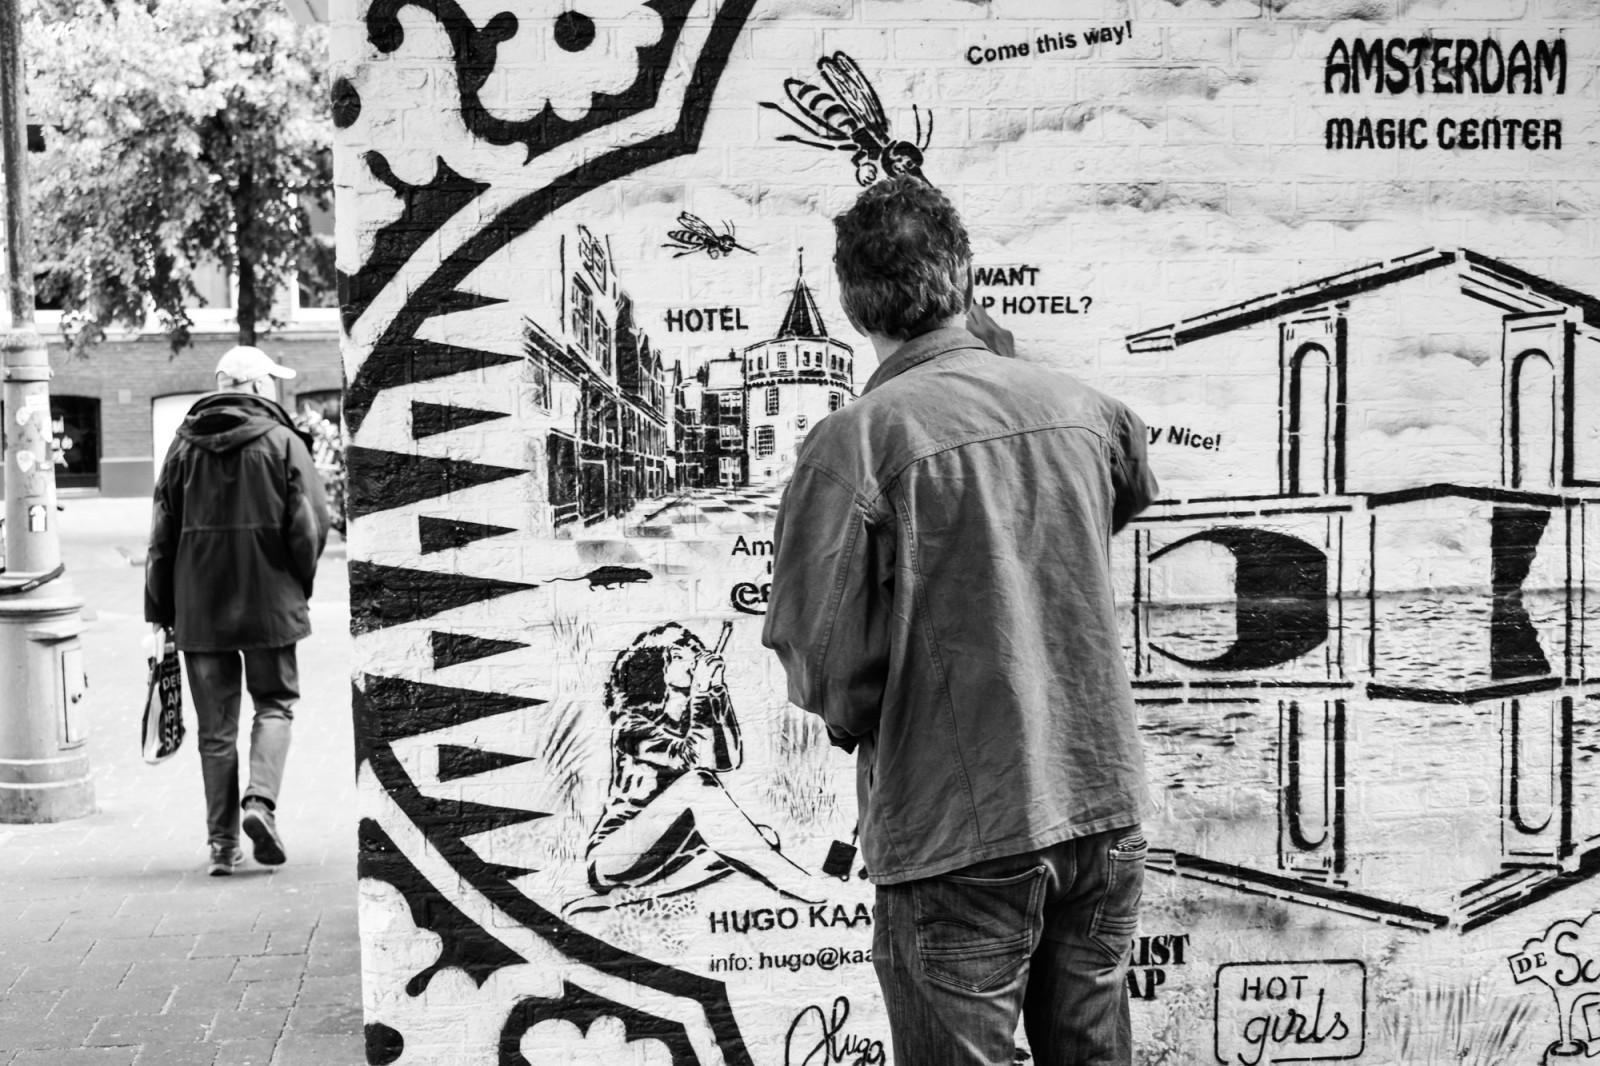 Graffiti urban Hugo Kaagman action magic center